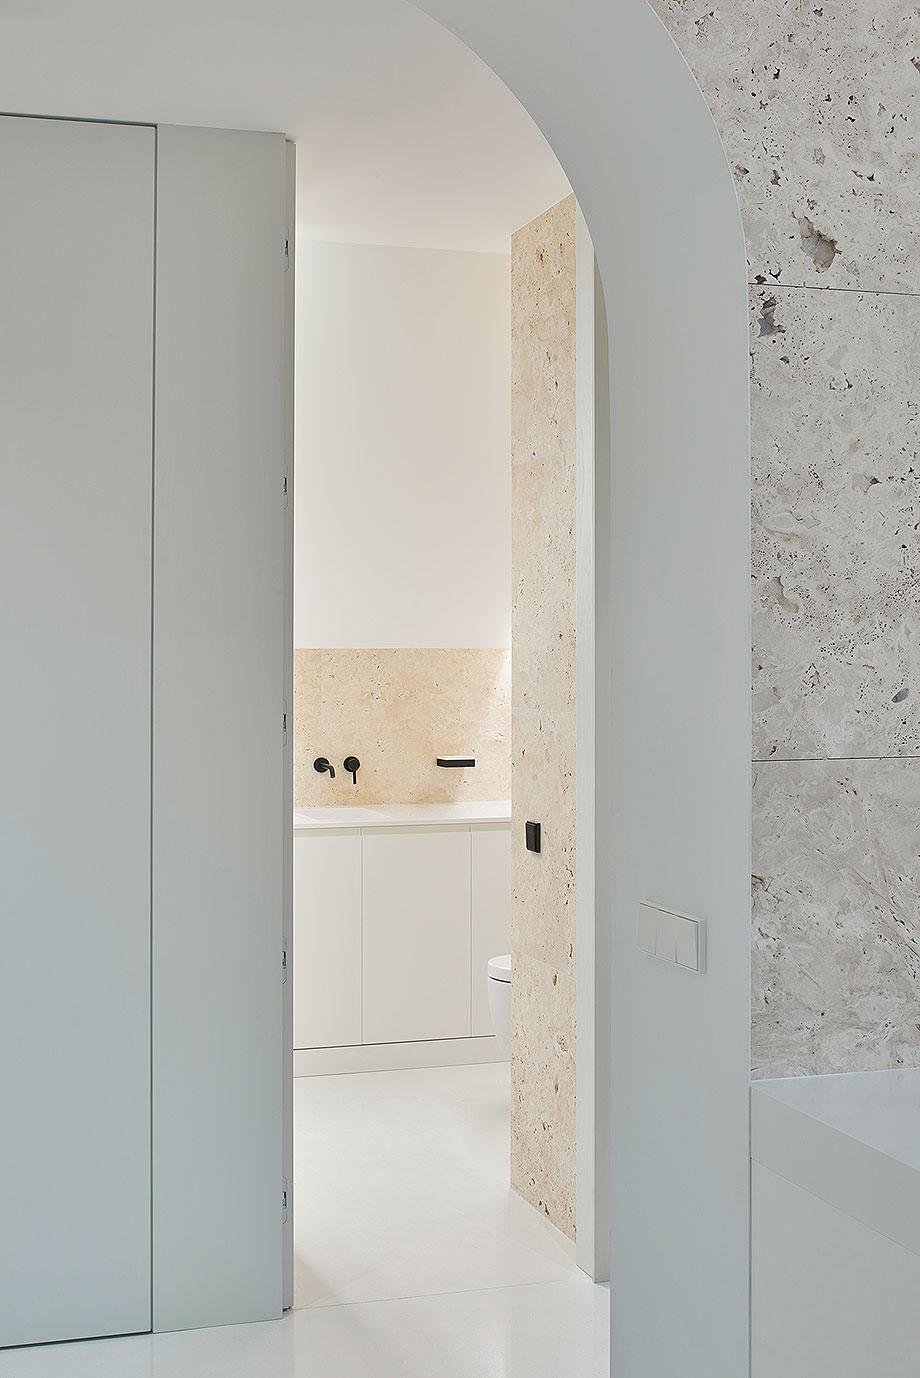 apartamento con un muro de piedra revestido con travertino por 2xj architects (7) - foto darius petrulaitis